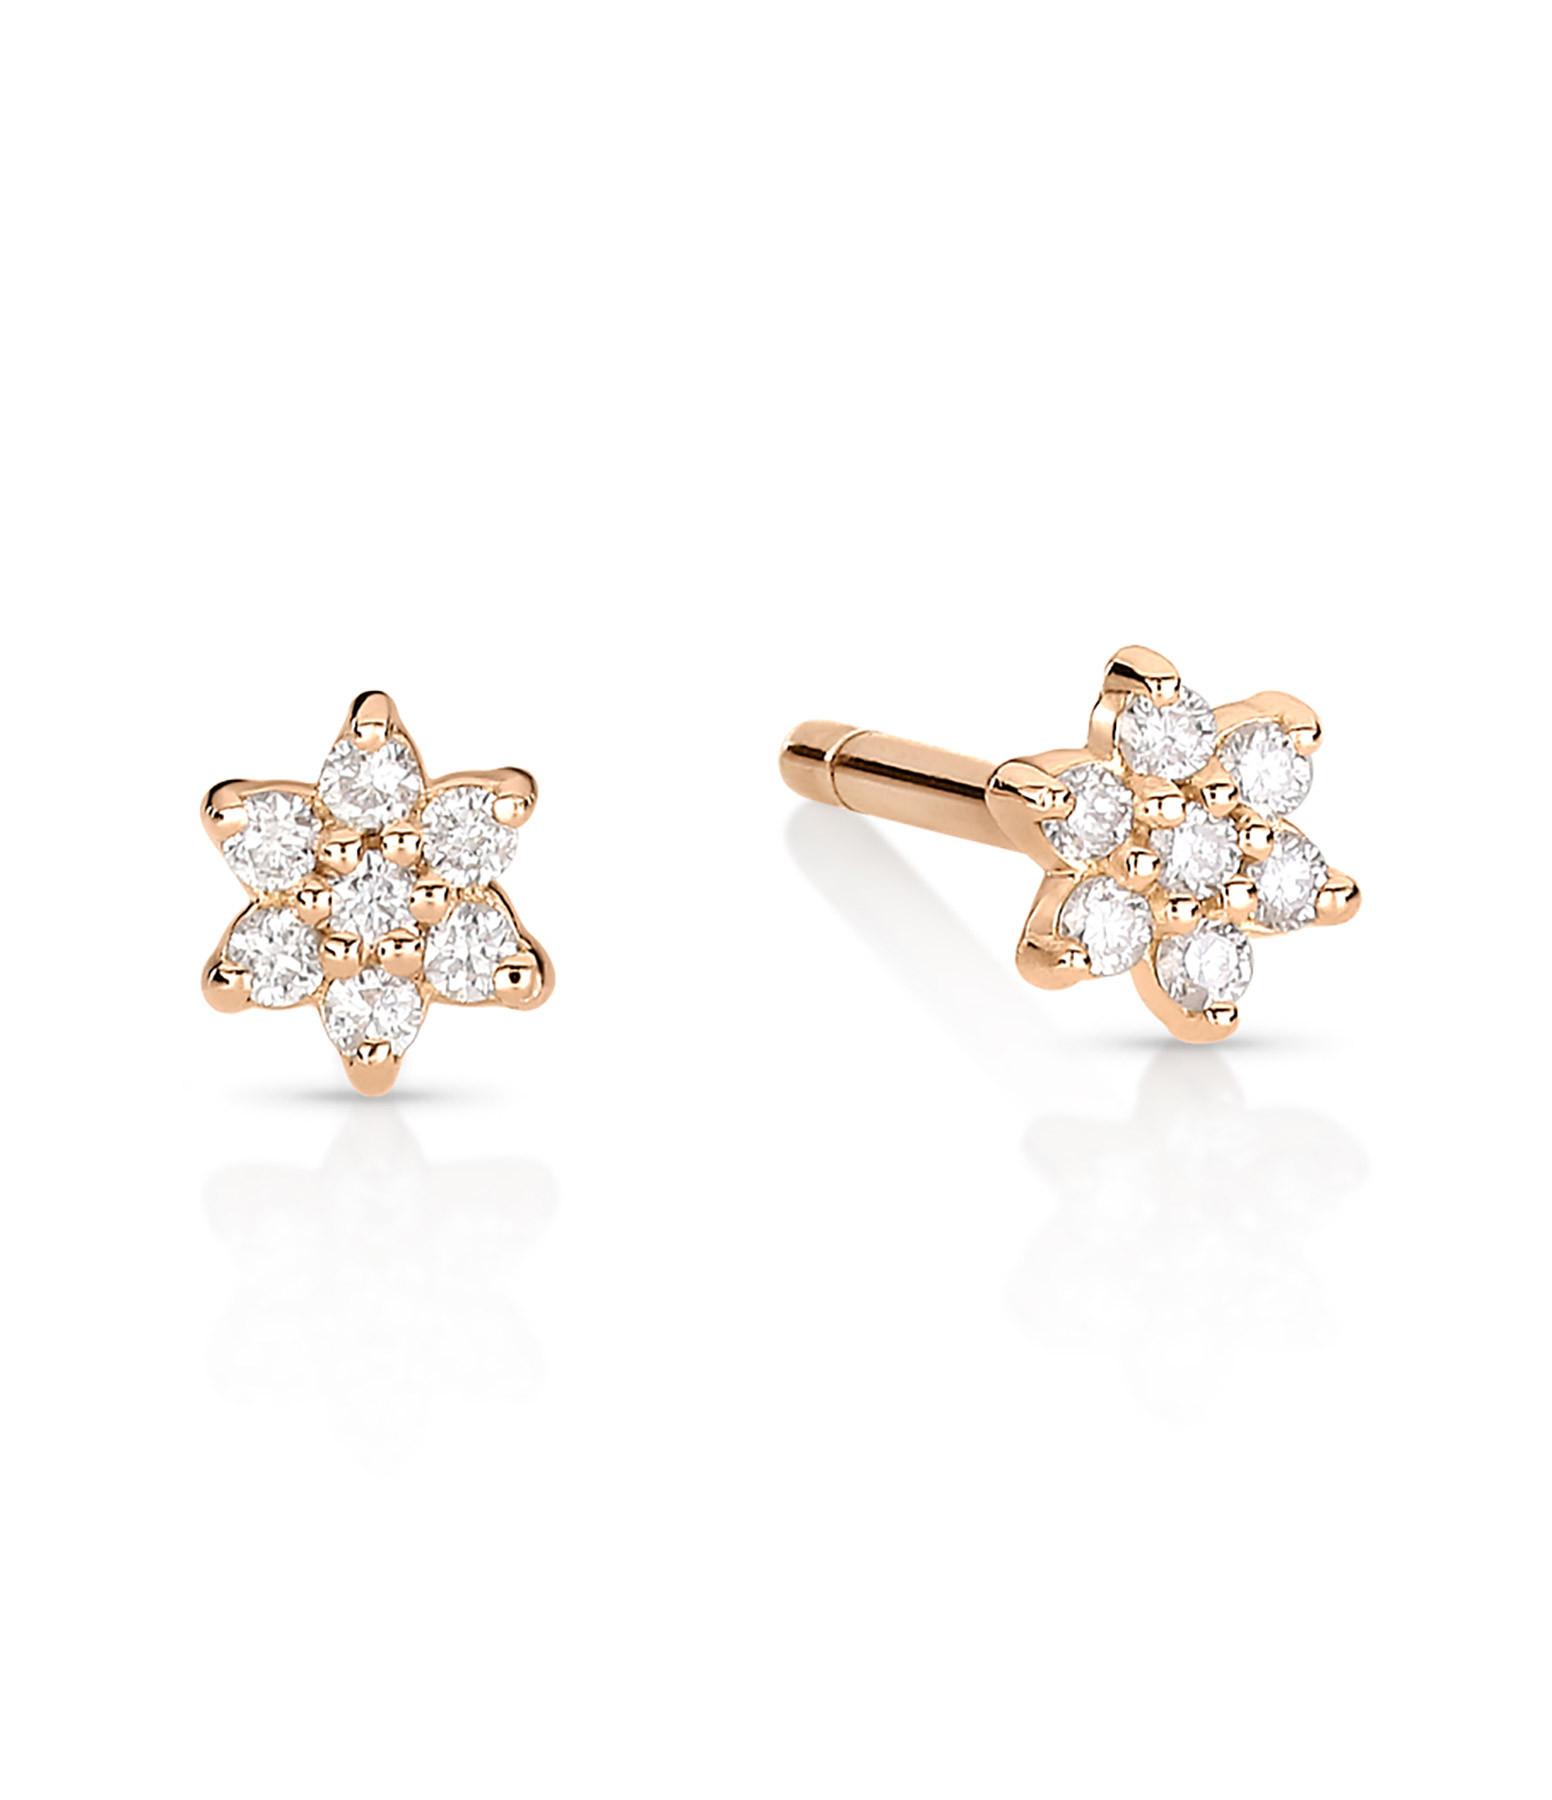 GINETTE NY - Boucles d'oreilles Mini Star Puces Diamants OR